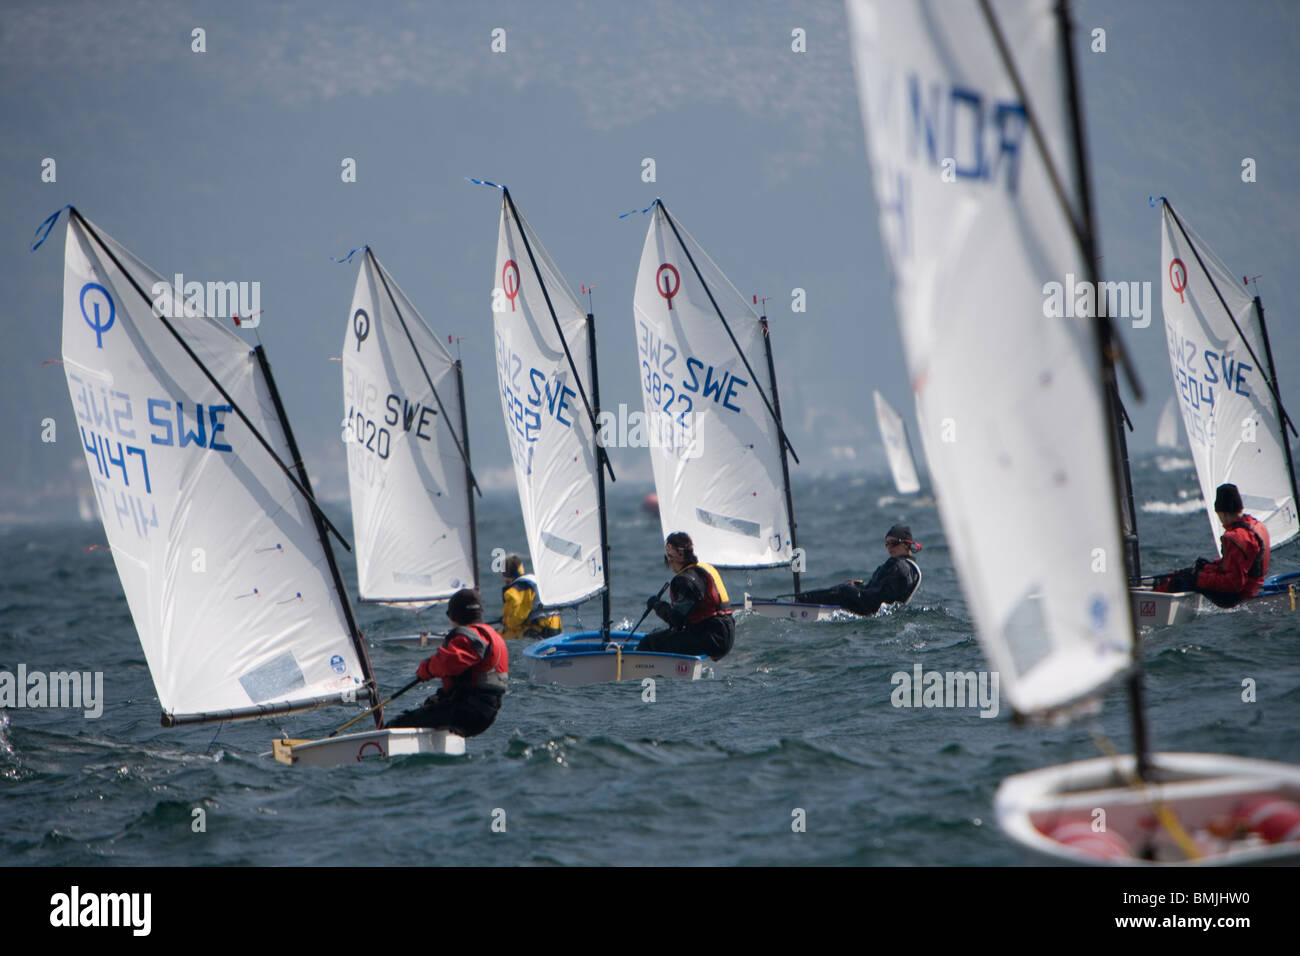 View of sail boat racing in lake - Stock Image